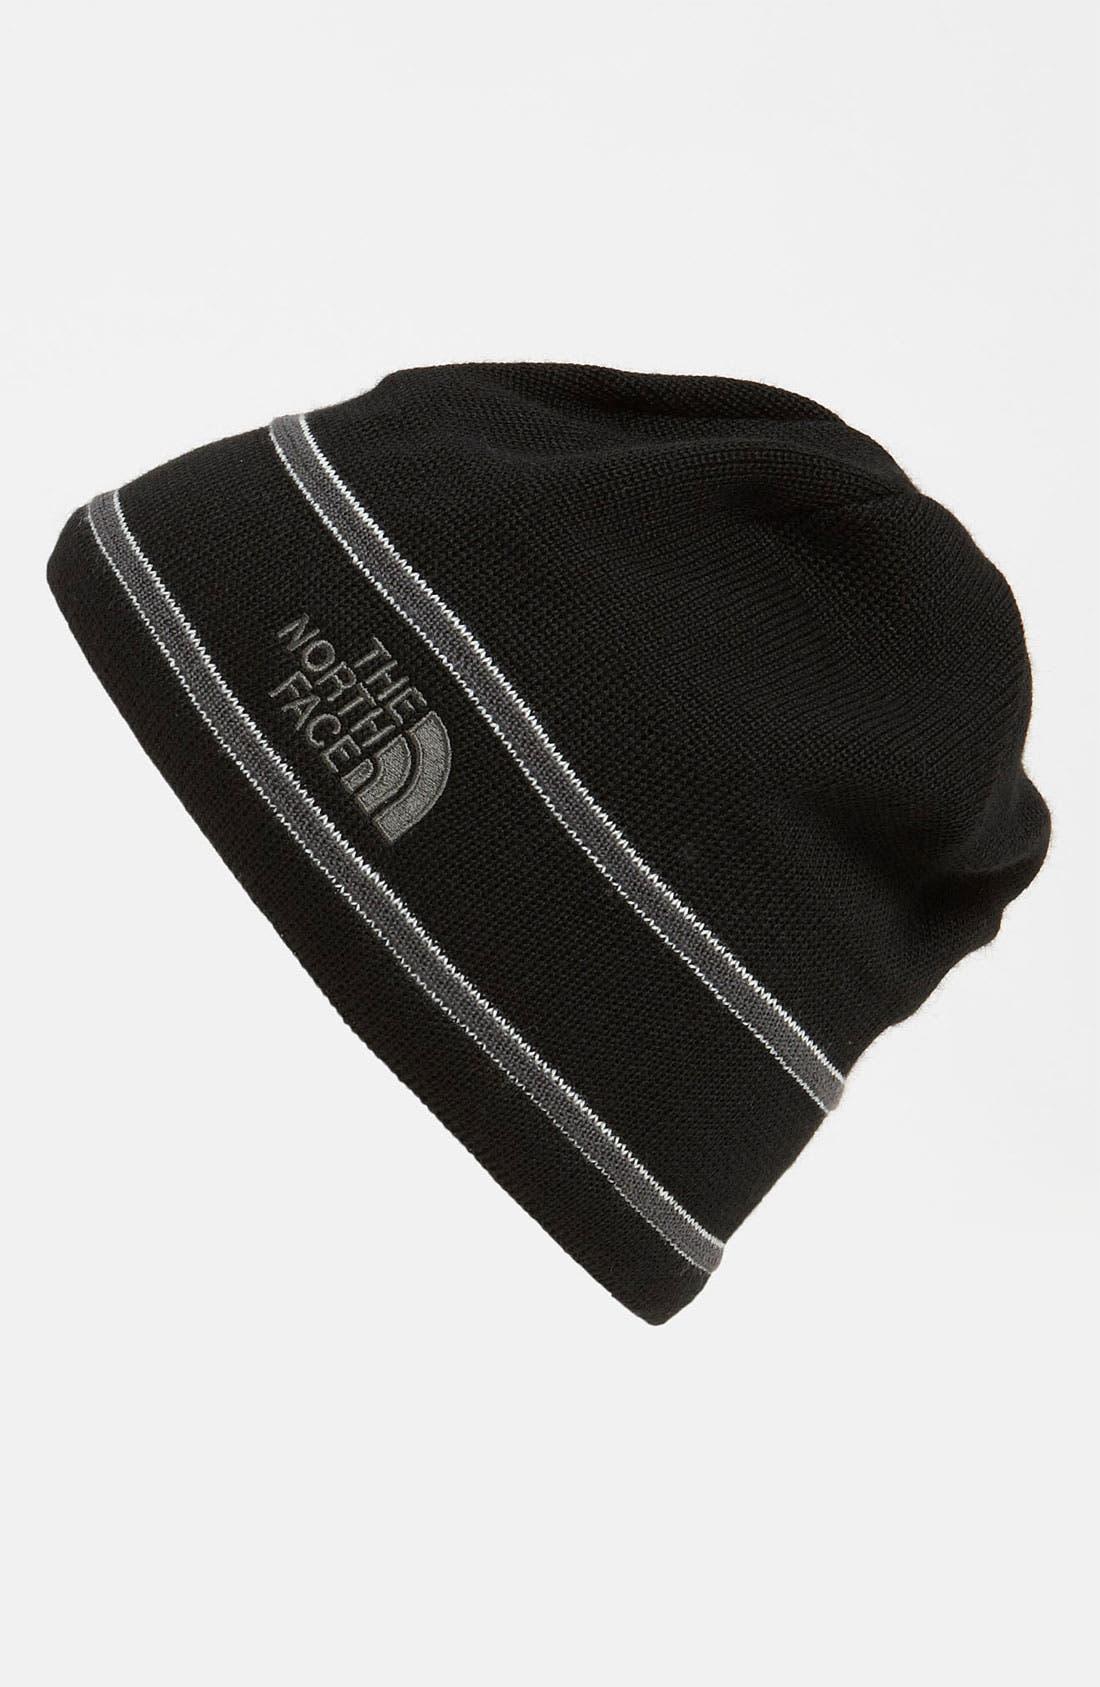 Main Image - The North Face Knit Cap